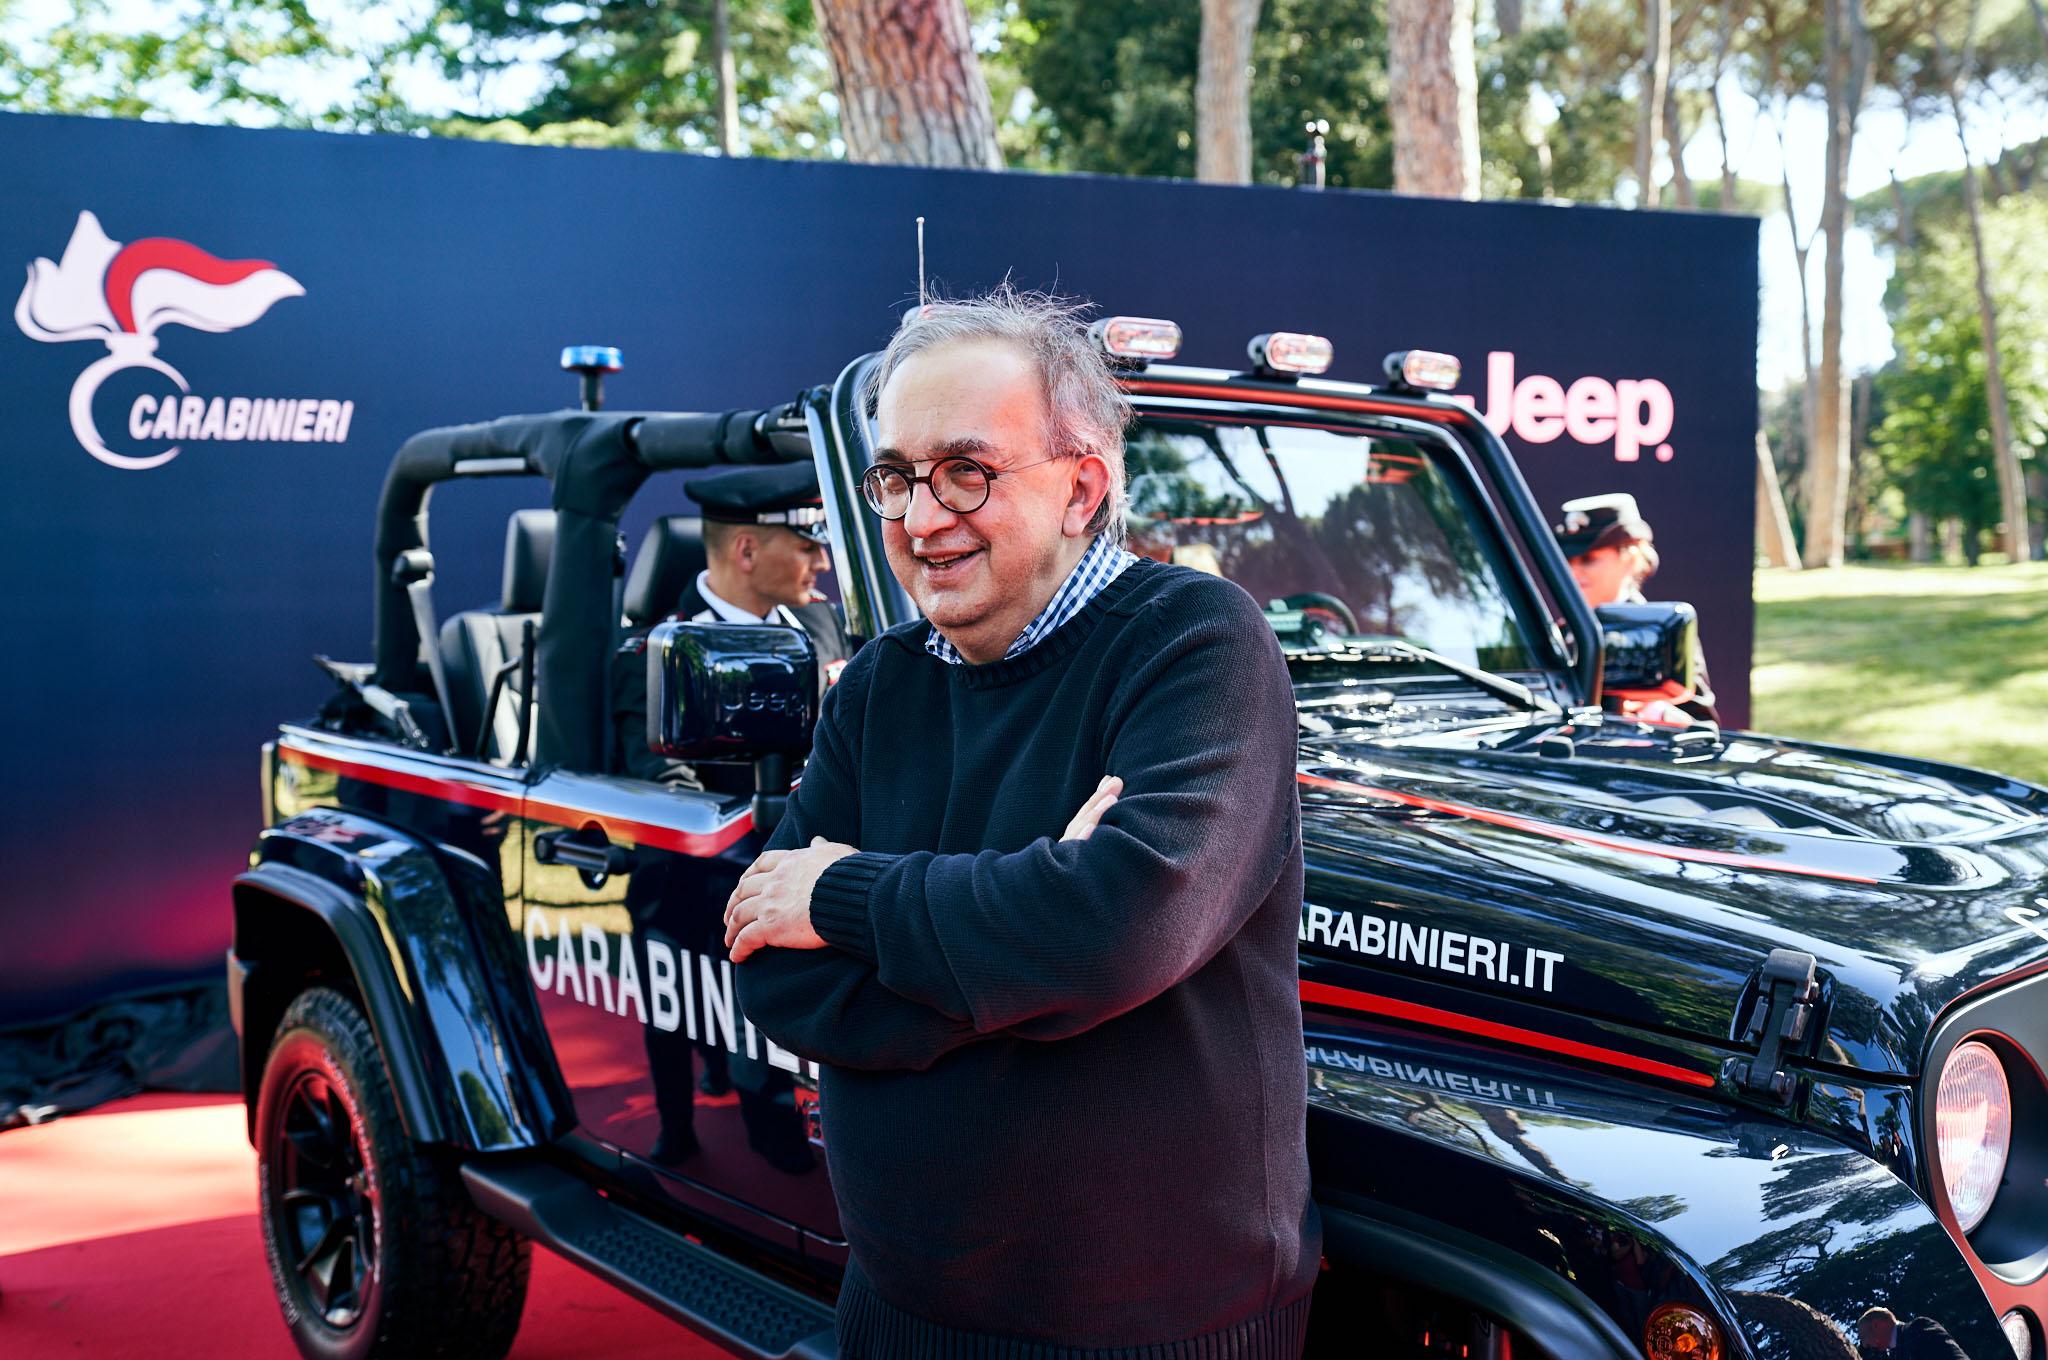 Jeep Wrangler Carabinieri Sergio Marchionne